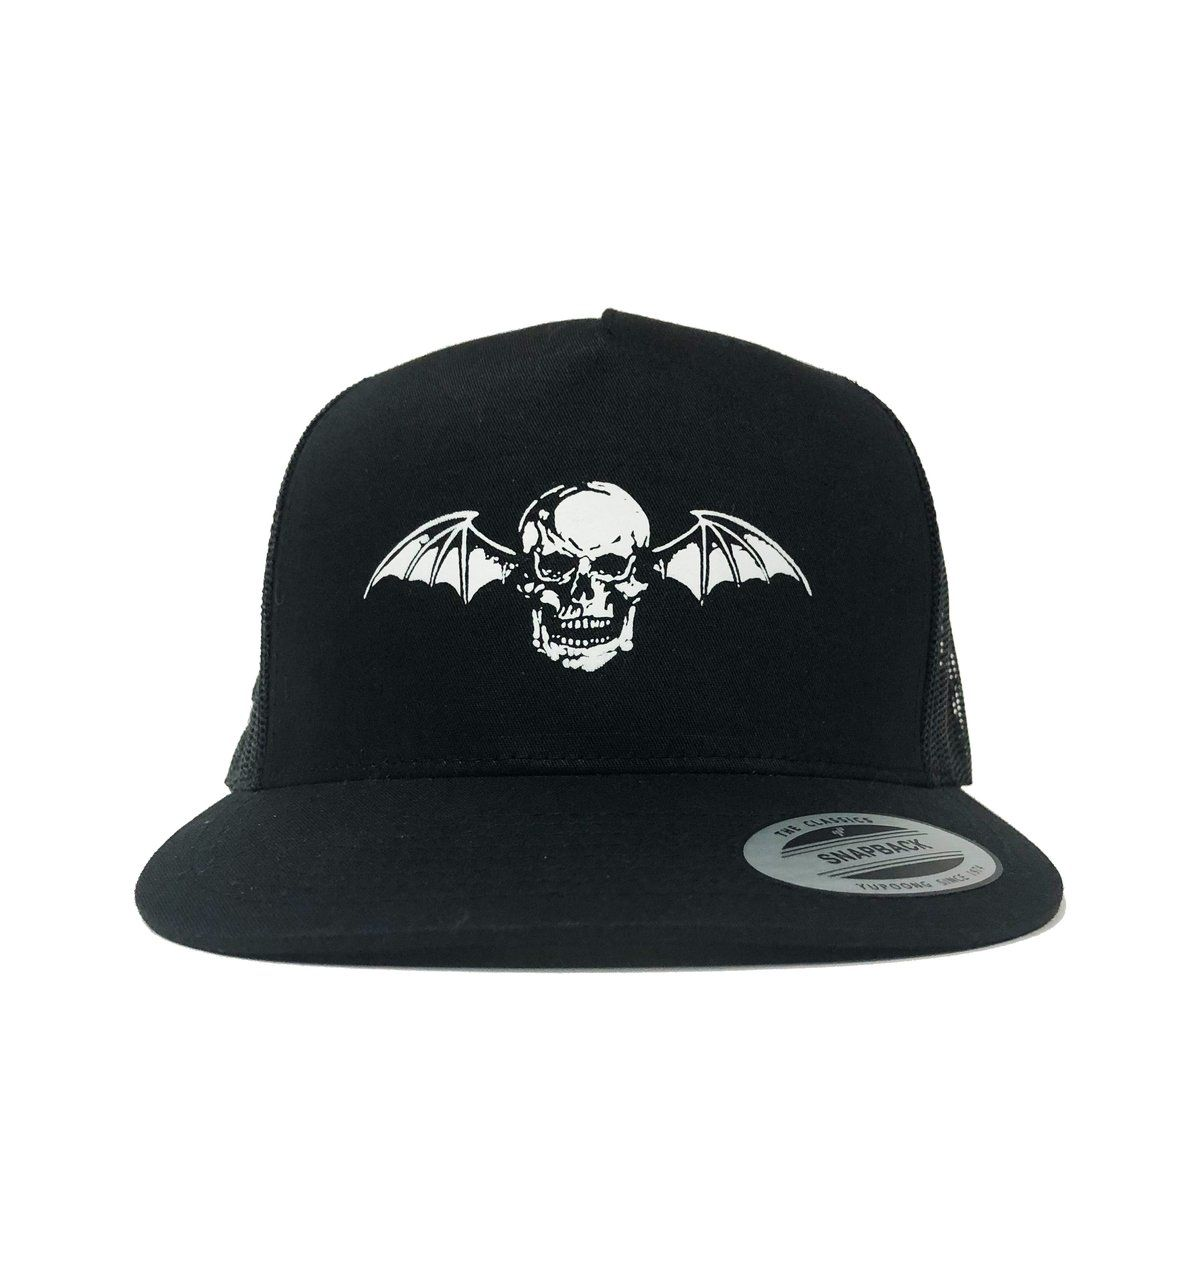 d3e10b94 Deathbat Trucker Hat in 2019 | Accessories | Hats, Beanie, Snapback